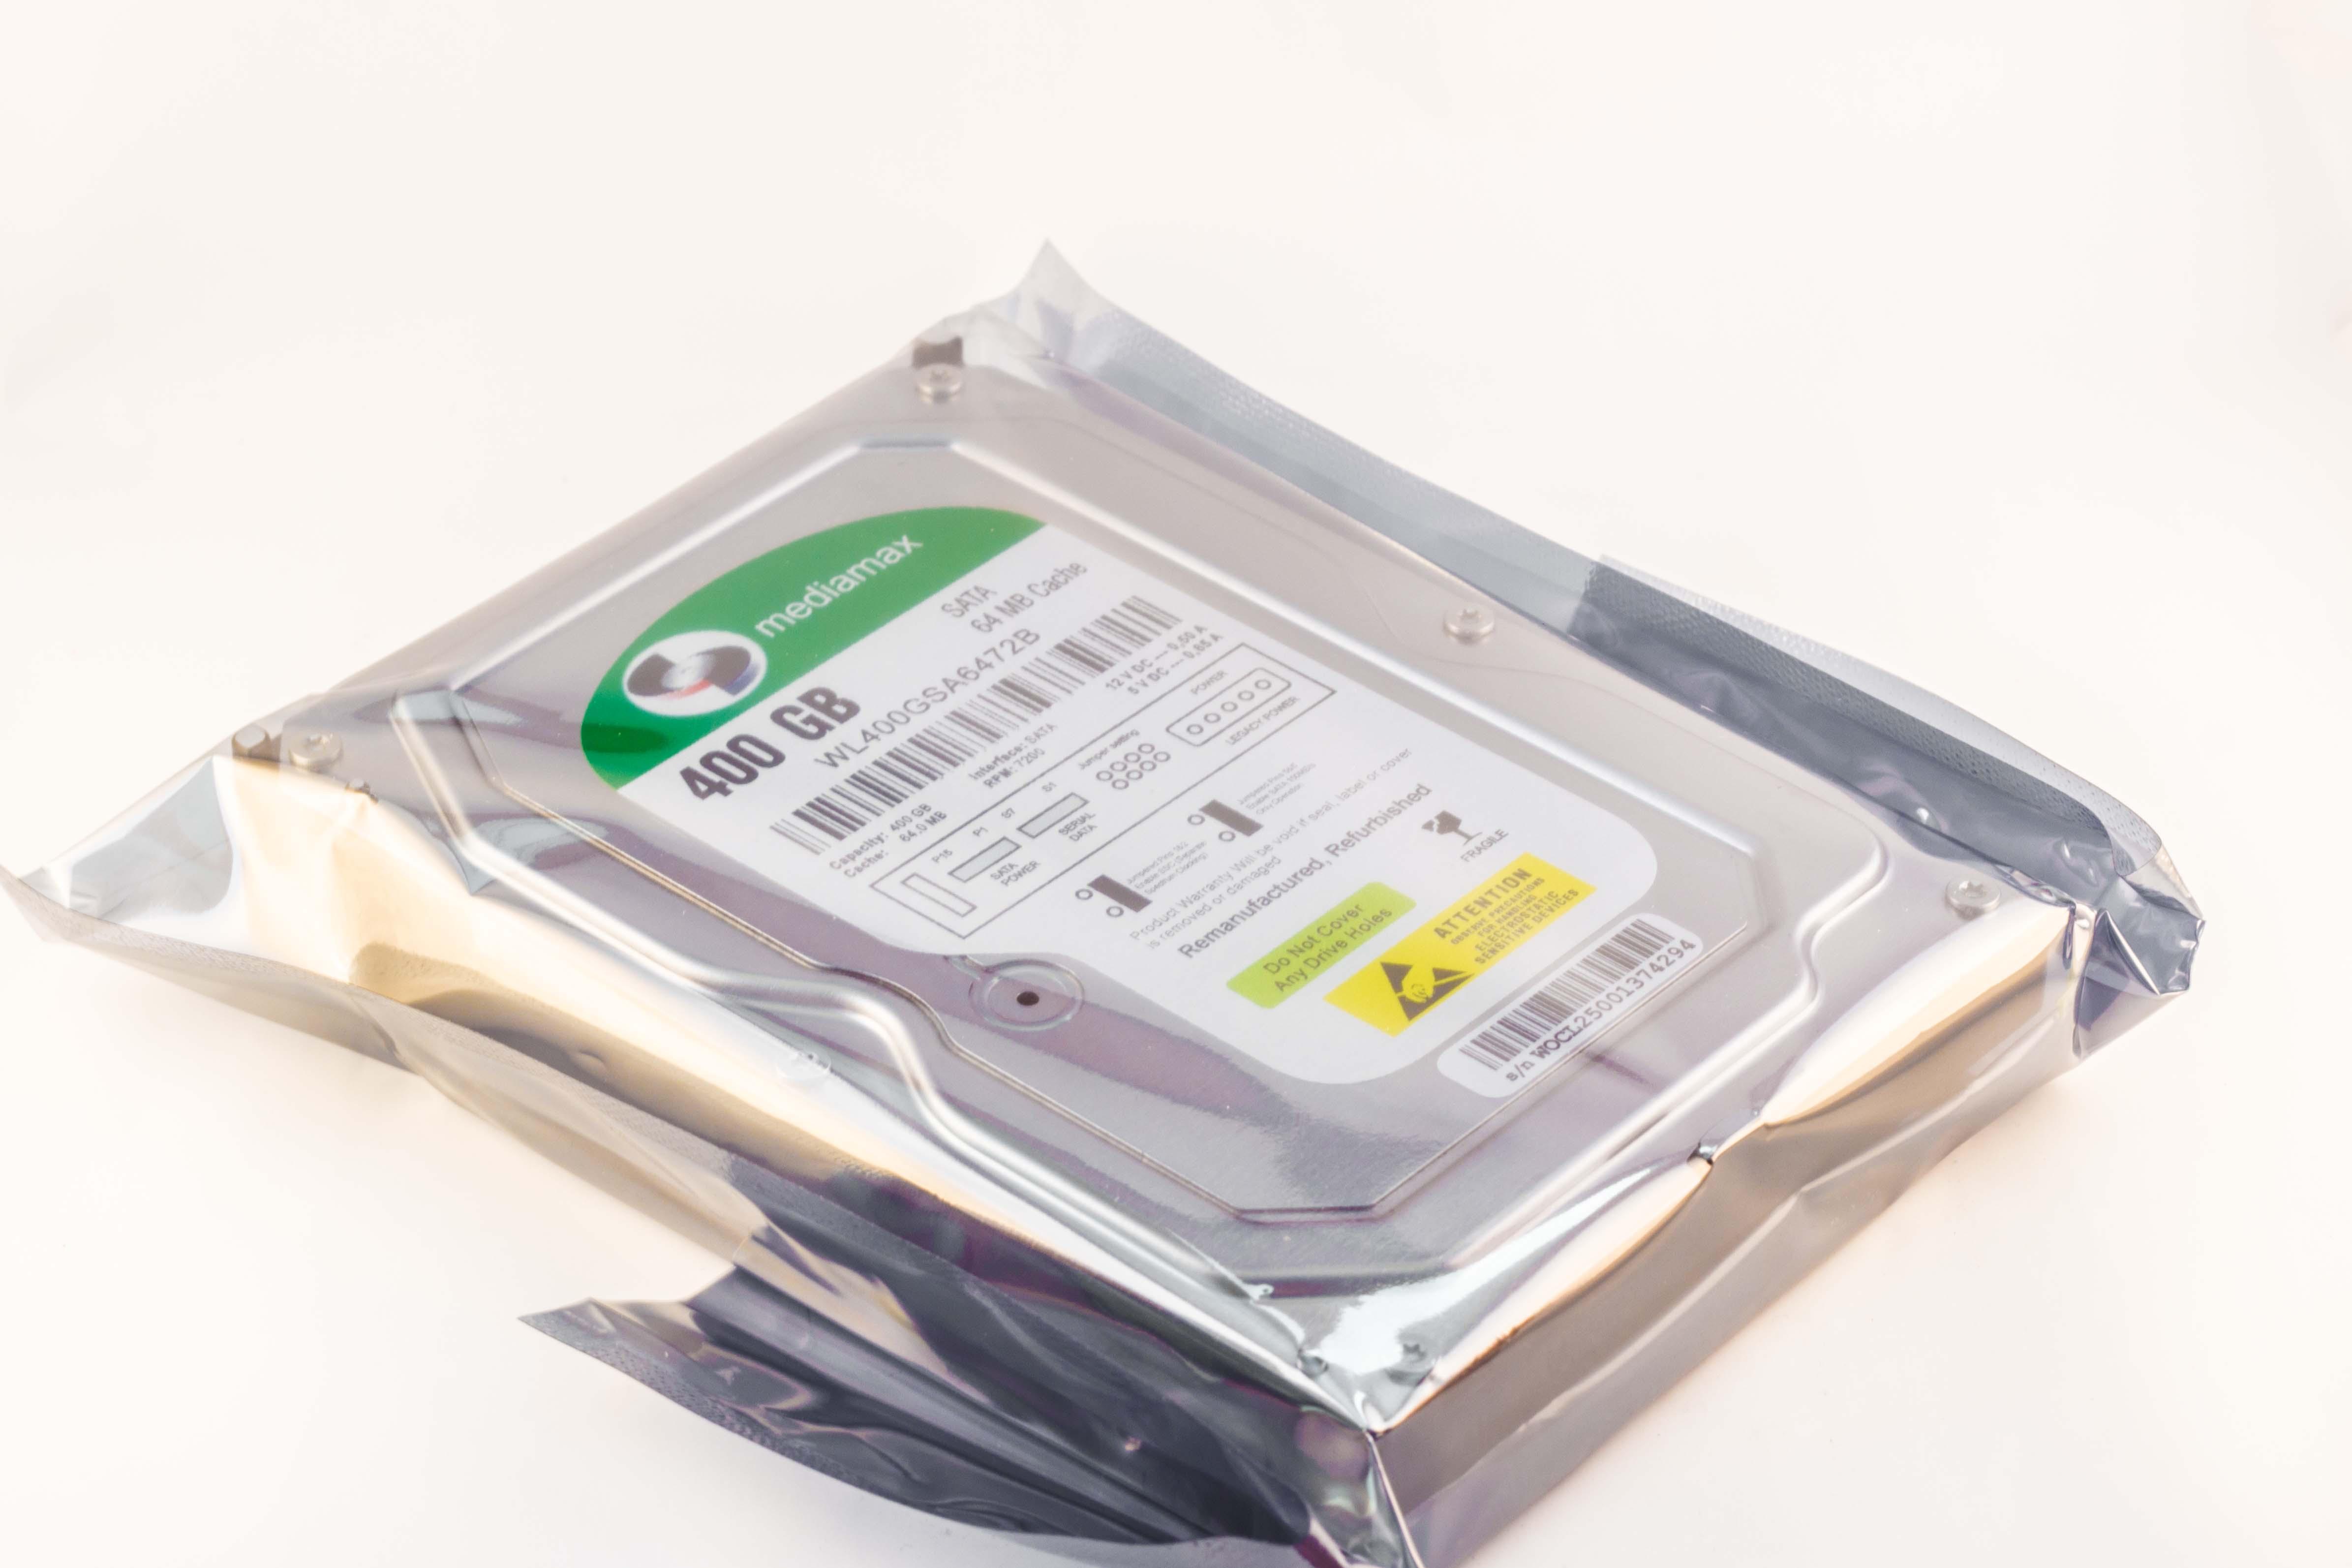 Жесткий диск MediaMax 400 GB